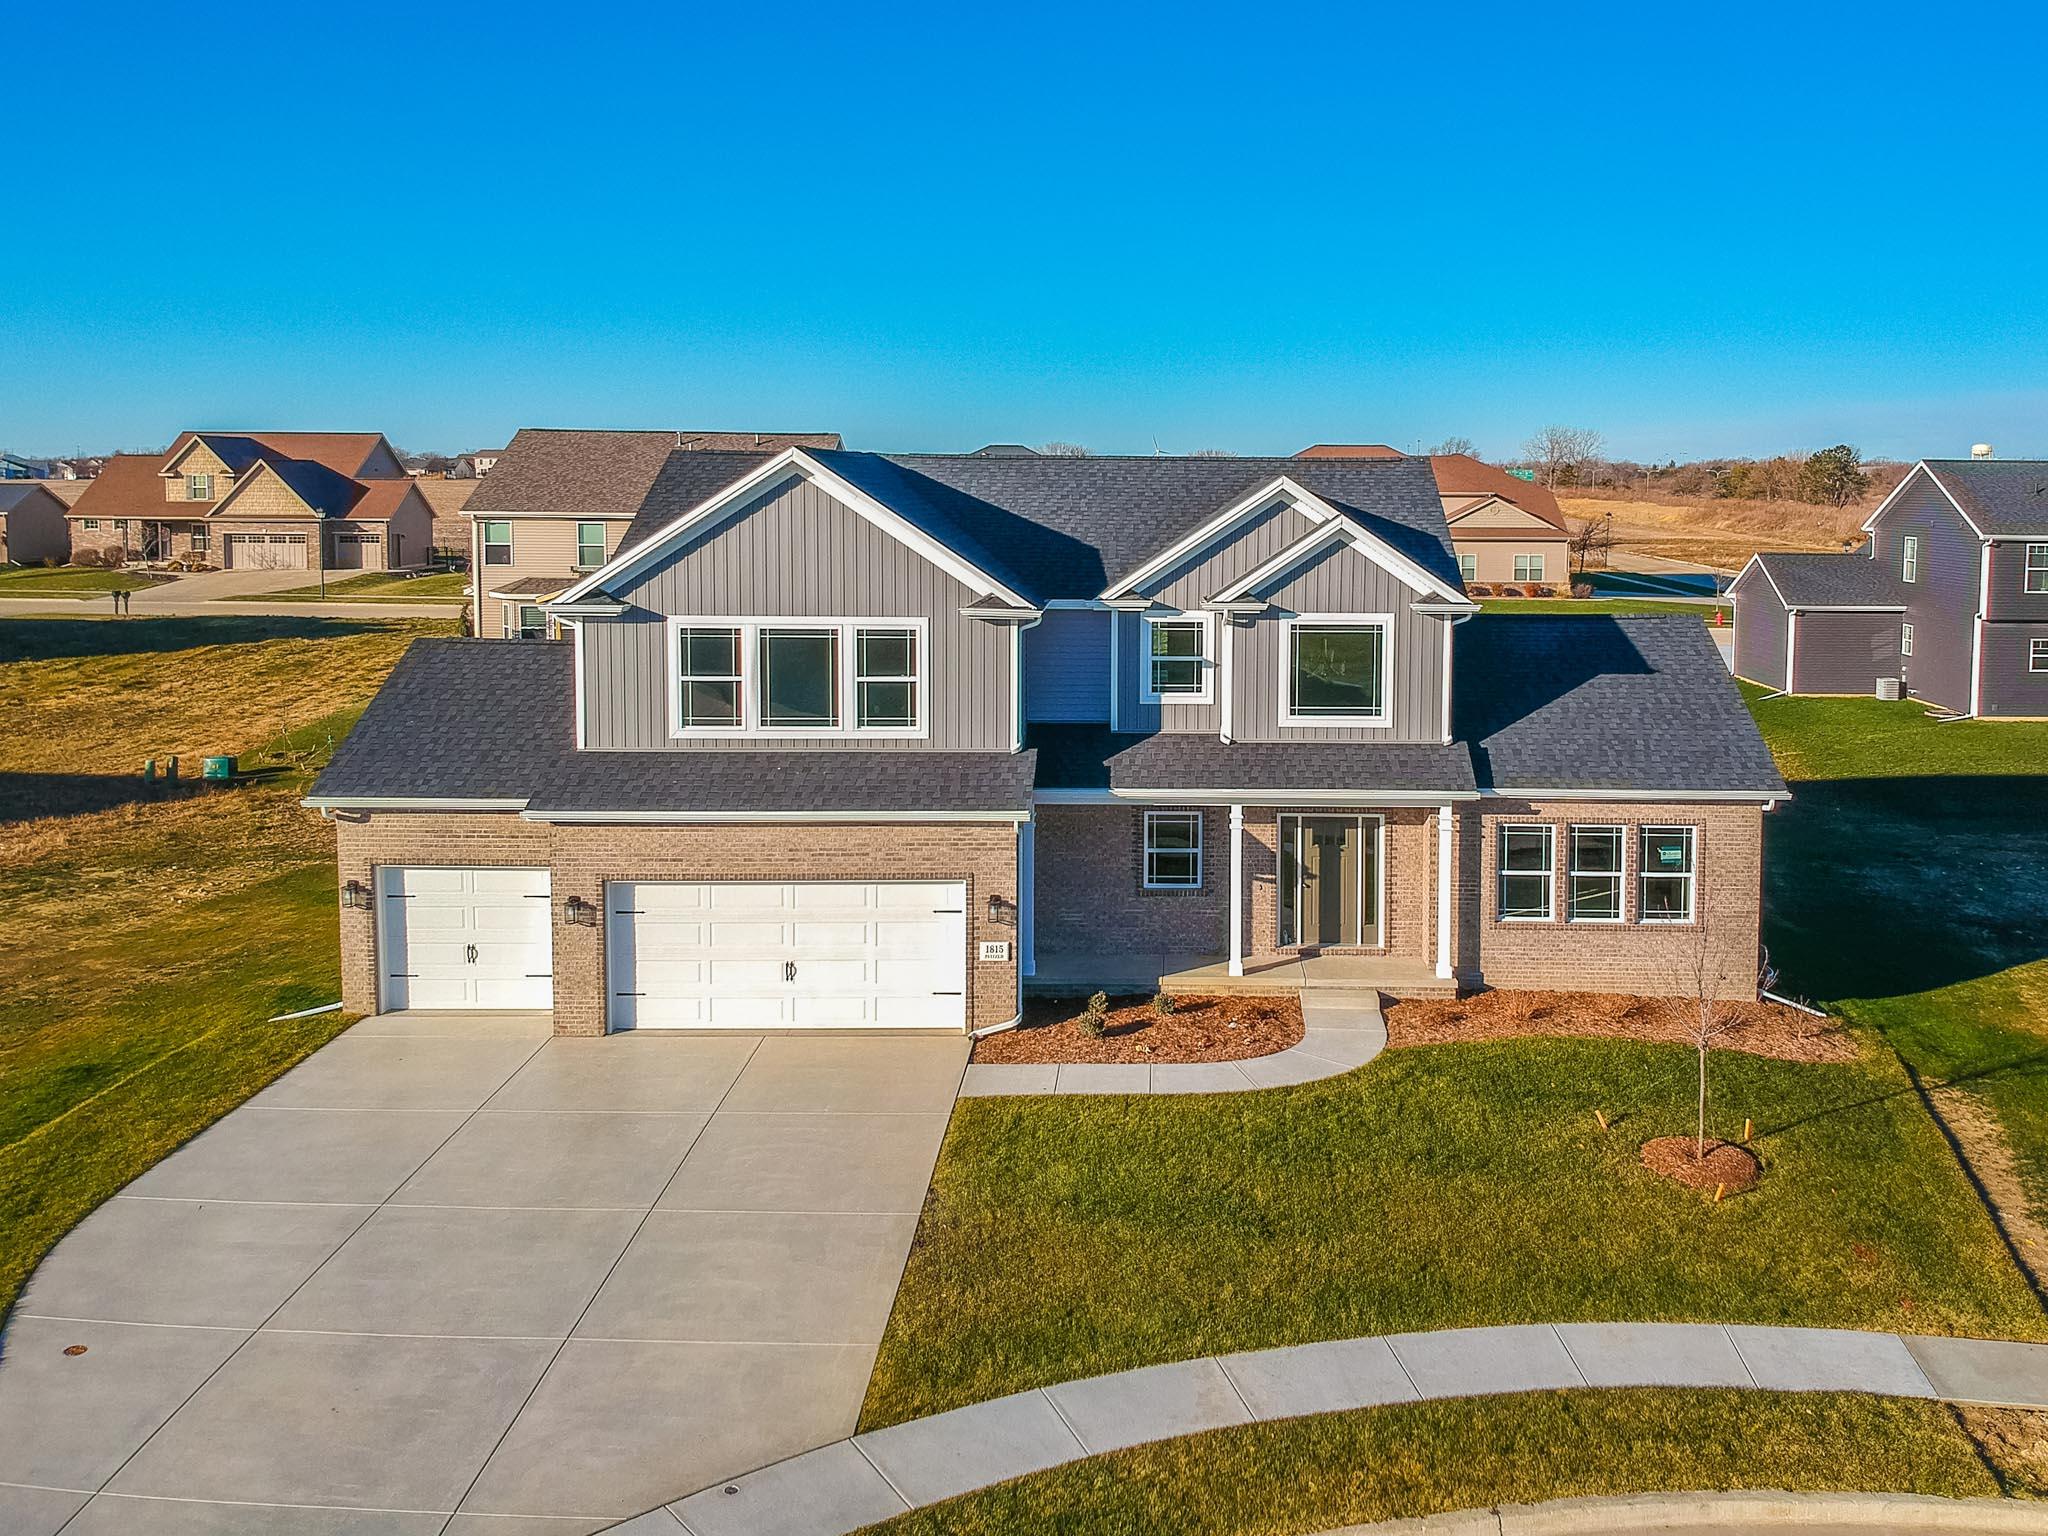 Hoffman Ochs Gc Blooomington Normal Homes For Sale